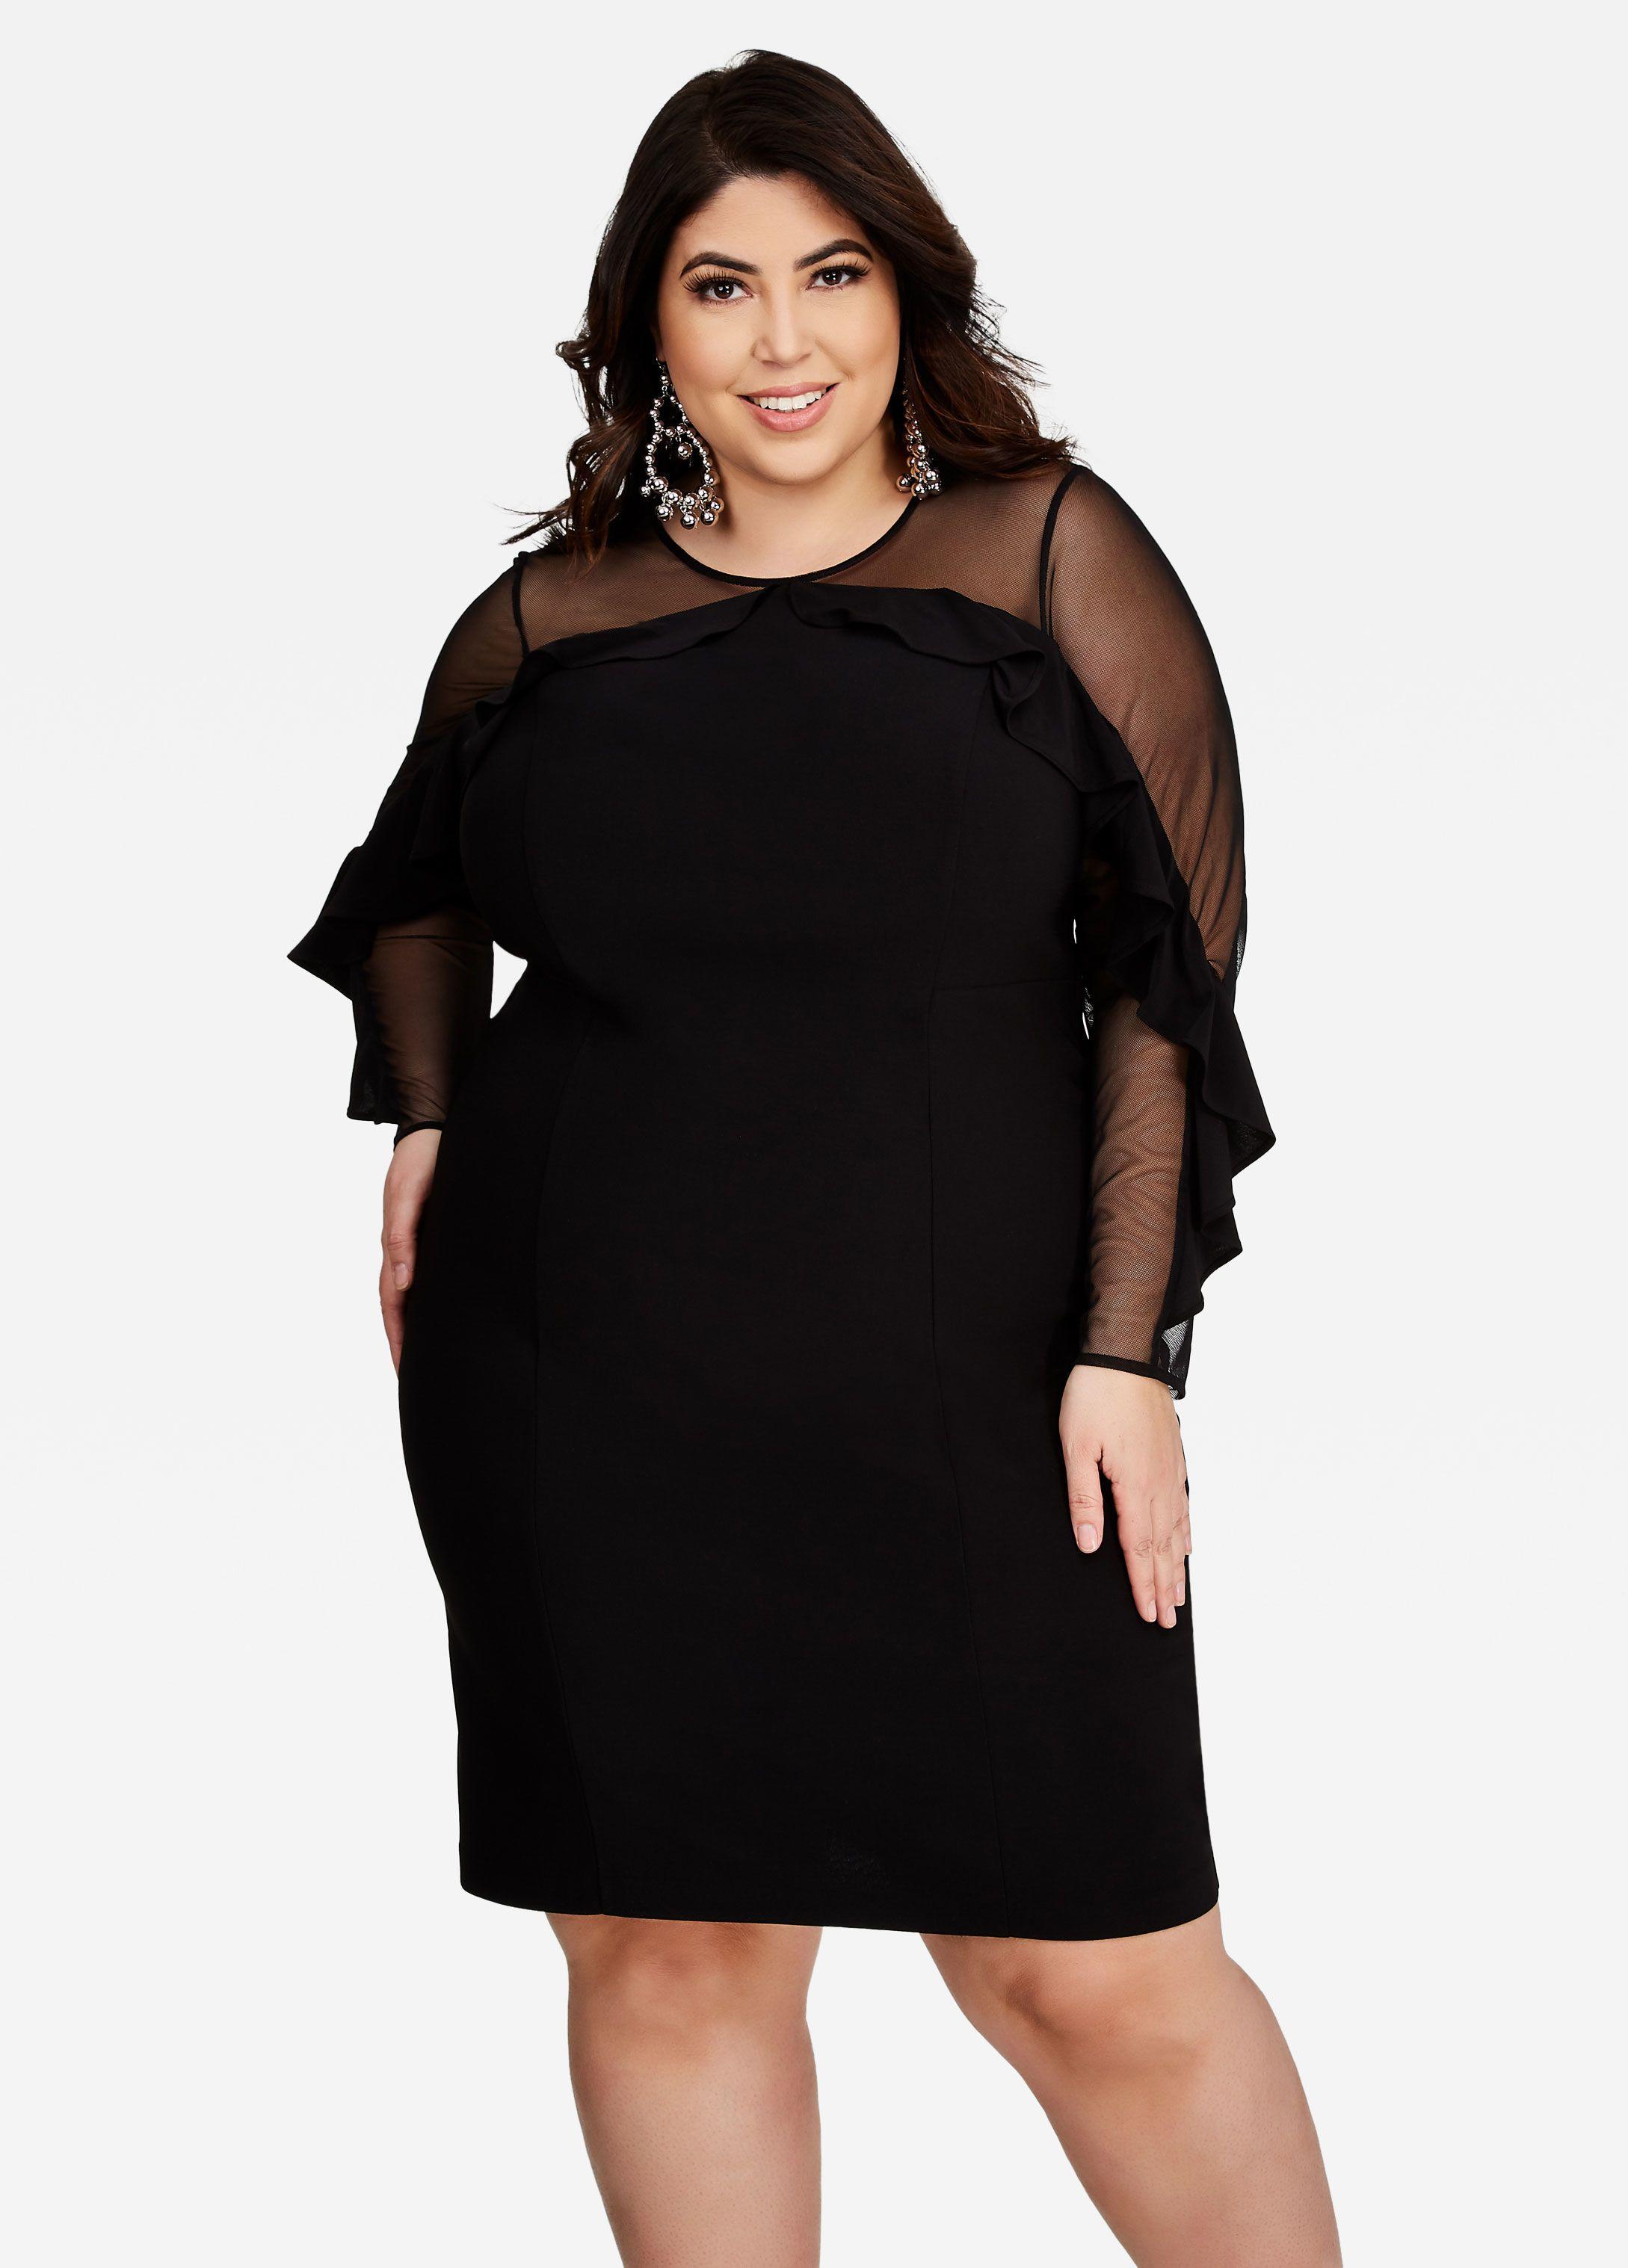 Mesh Neck Ruffle Dress | Jessica Milagros | Dresses, Ruffle dress ...